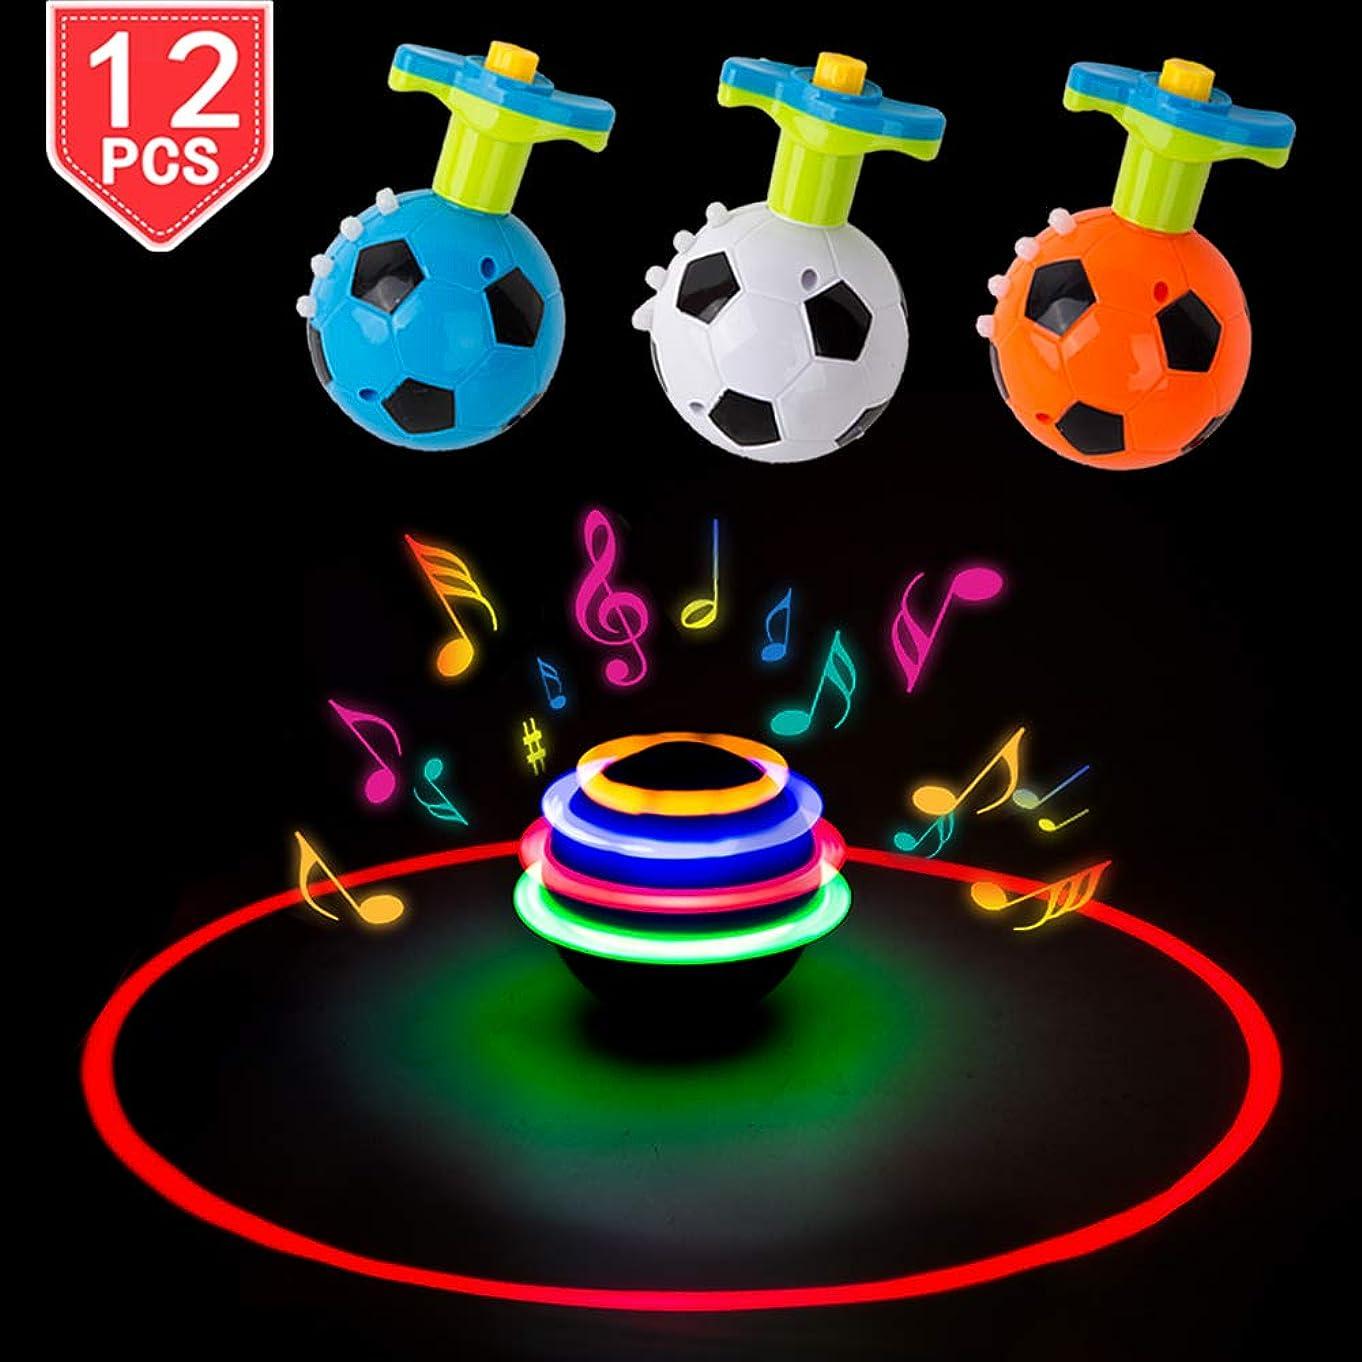 PROLOSO Spinning Top LED Toys Light Up Rotary Desktop Football Gyro 12 Pcs